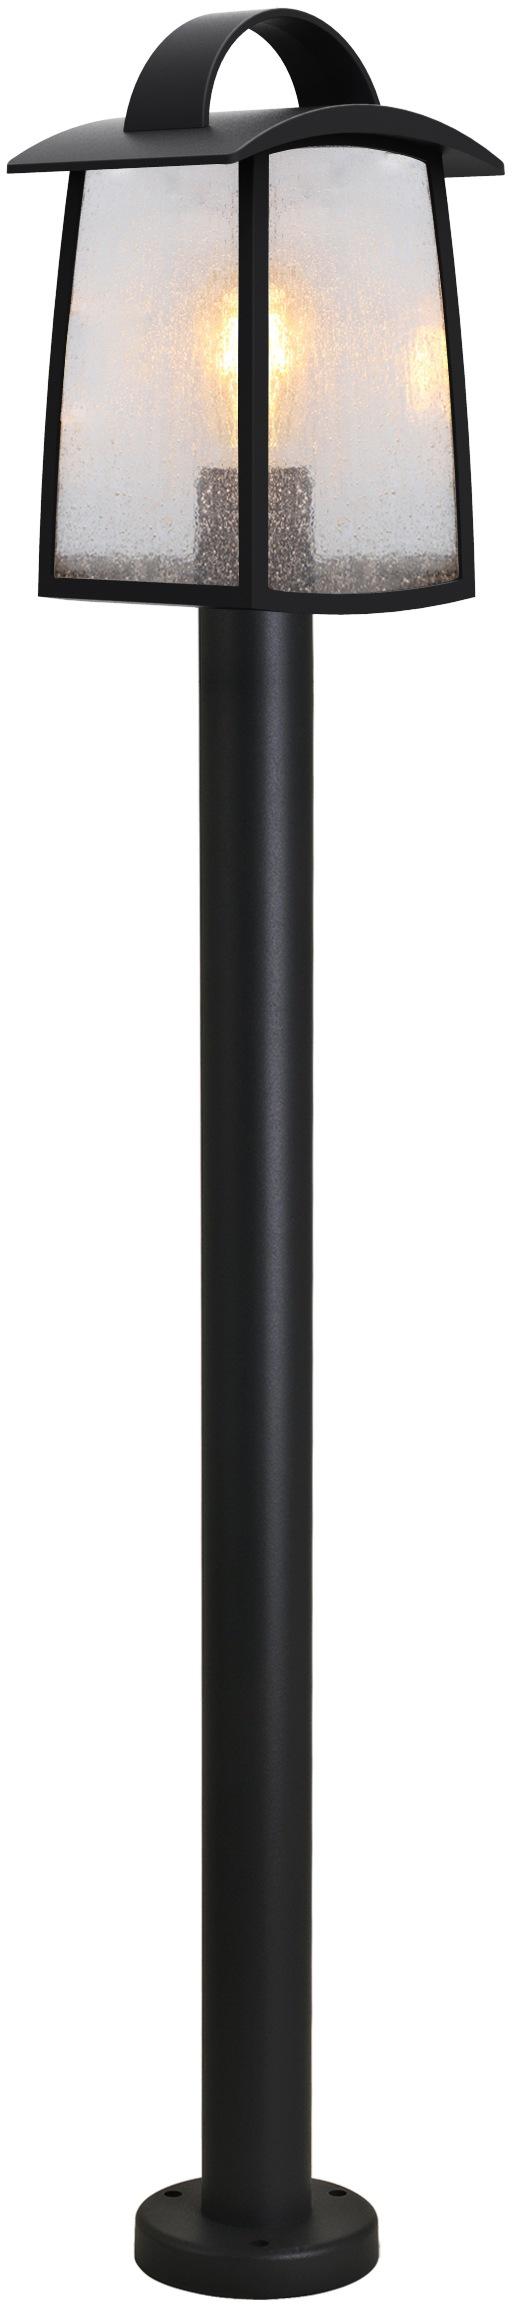 LUTEC Pollerleuchte KELSEY 7273601012, E27, 1 St.